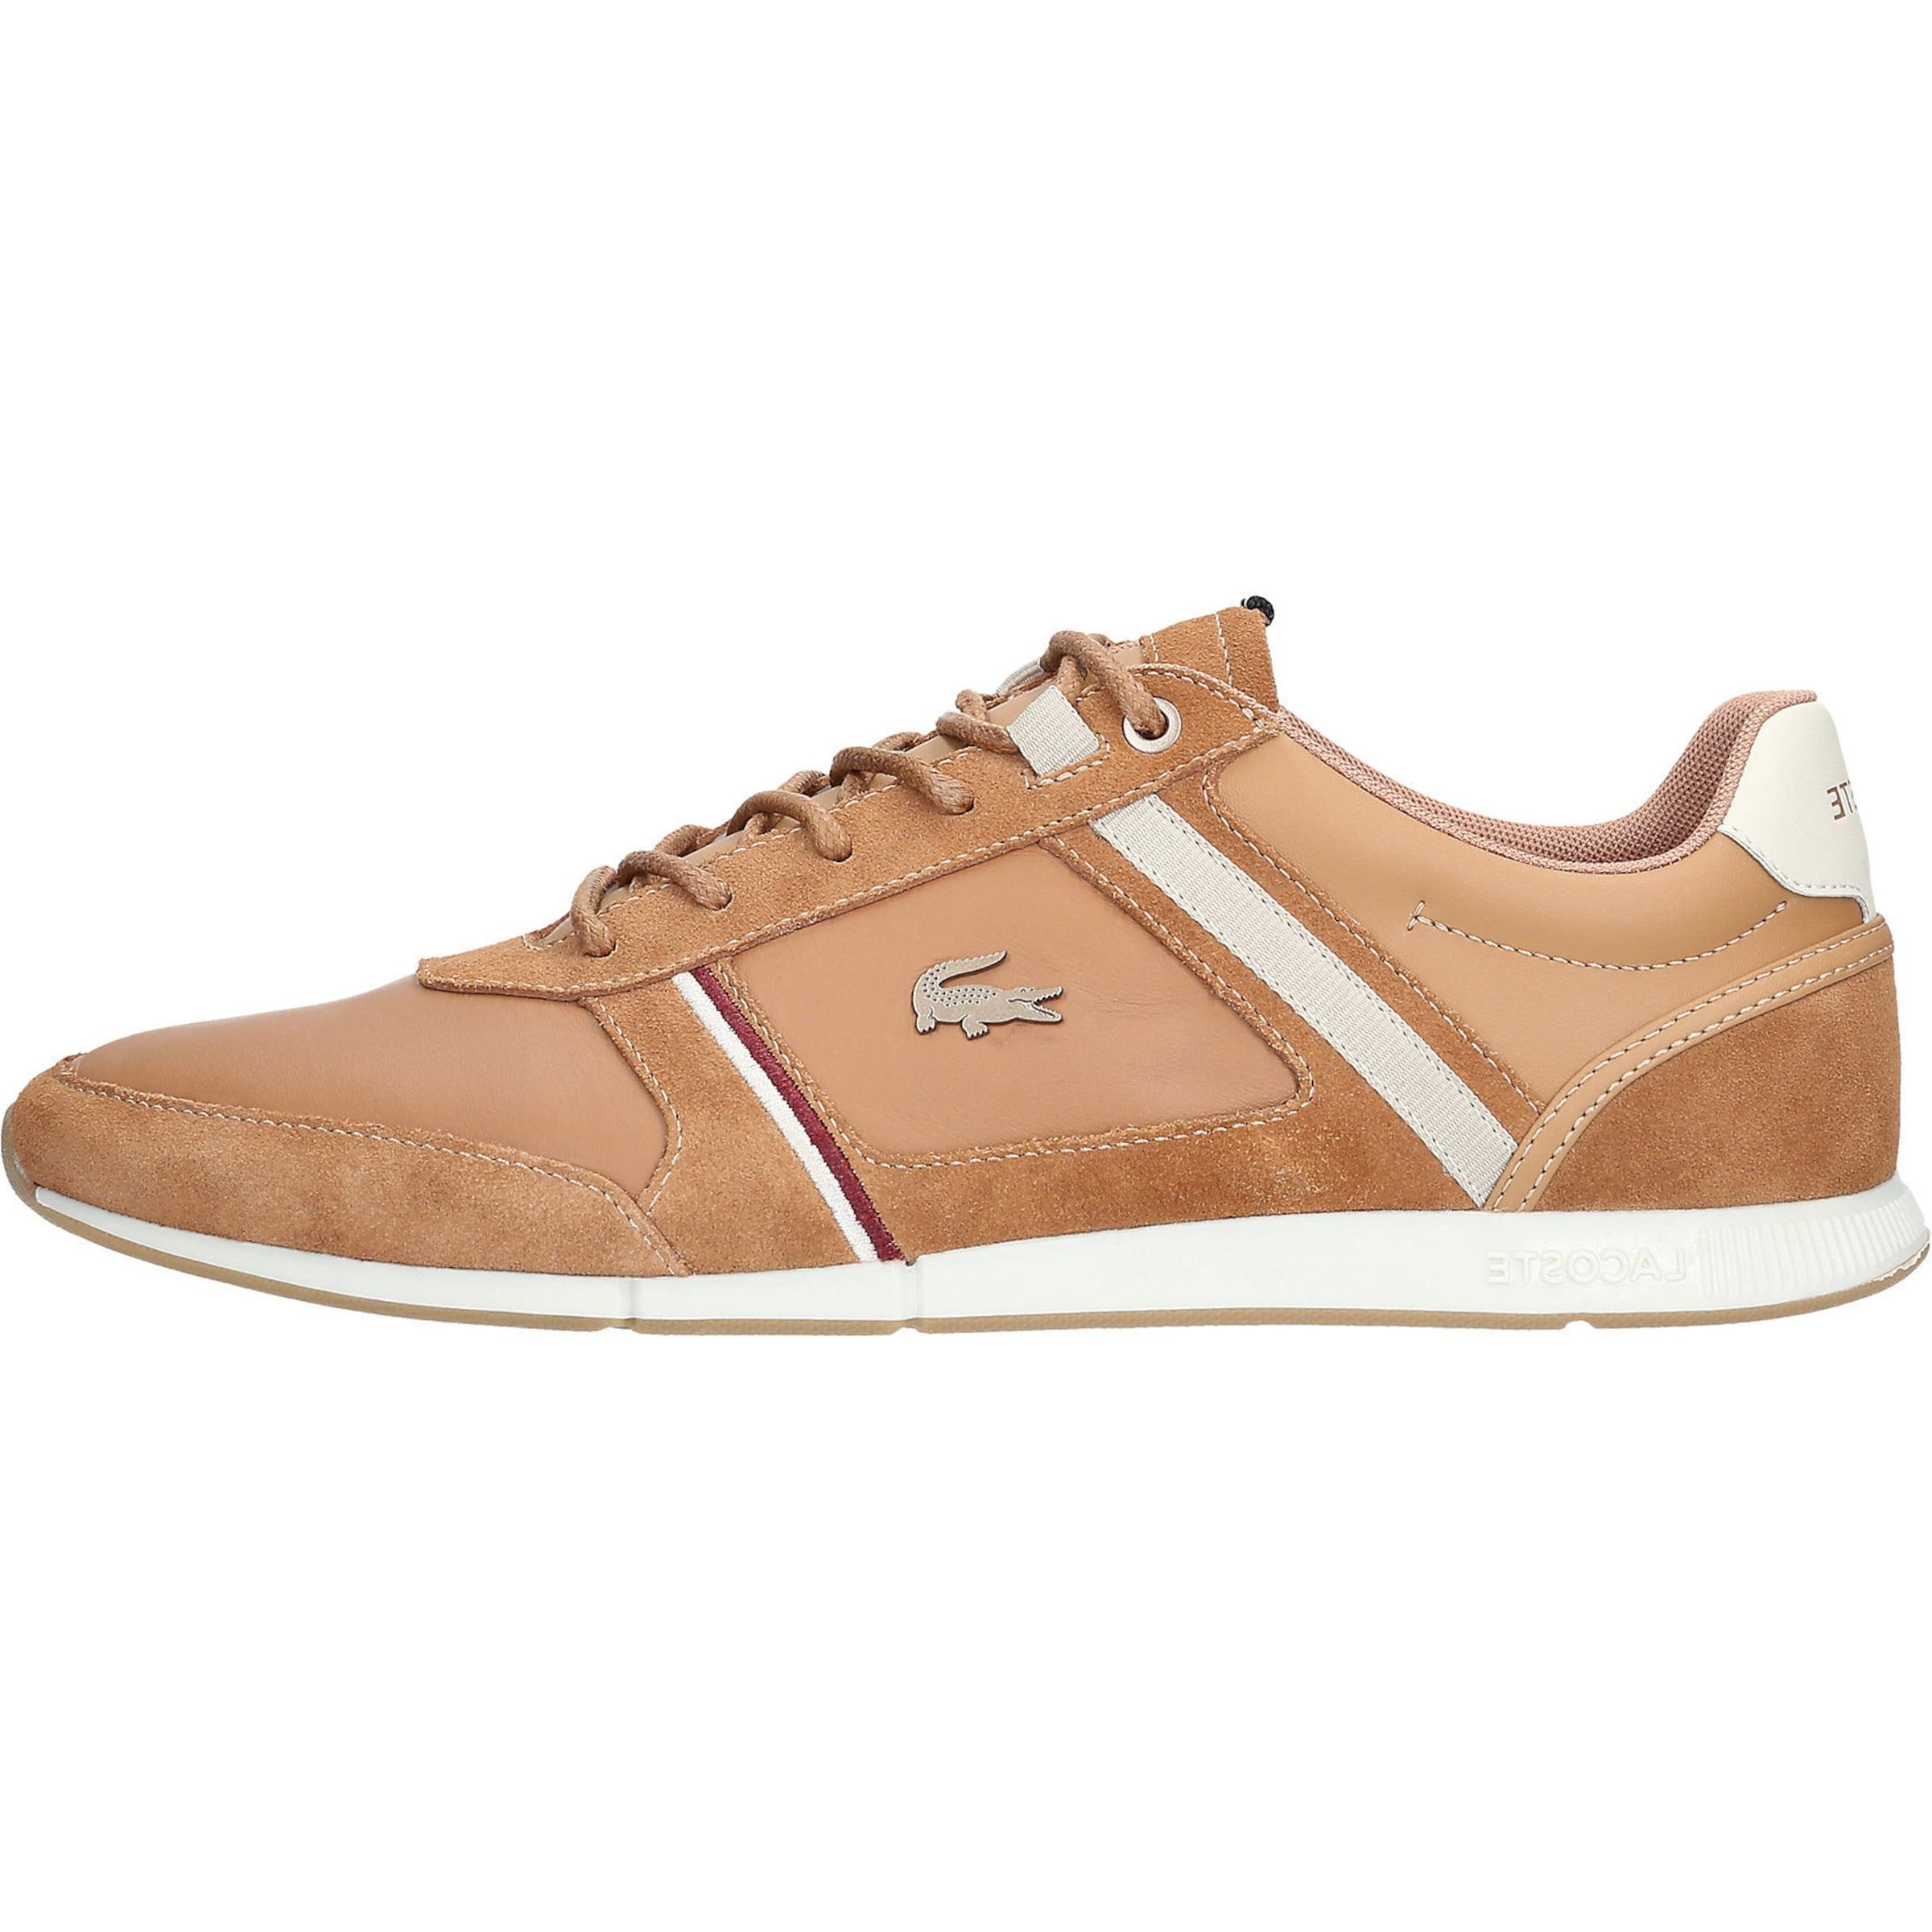 LACOSTE Menerva 118 1 Cam Sneakers